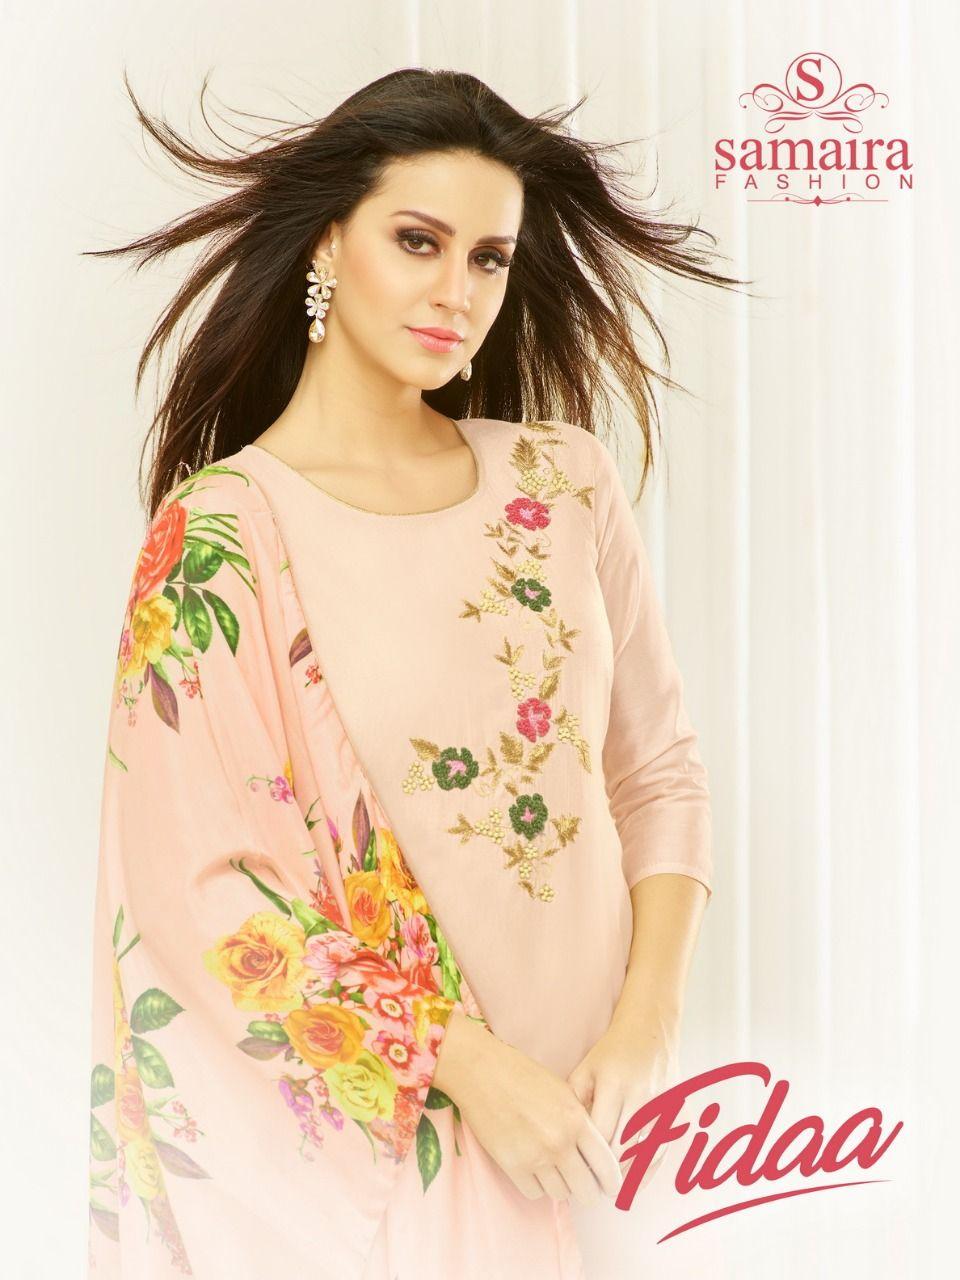 Samaira Fashion Fidaa Upada Silk With Embroidery Work Dress Material